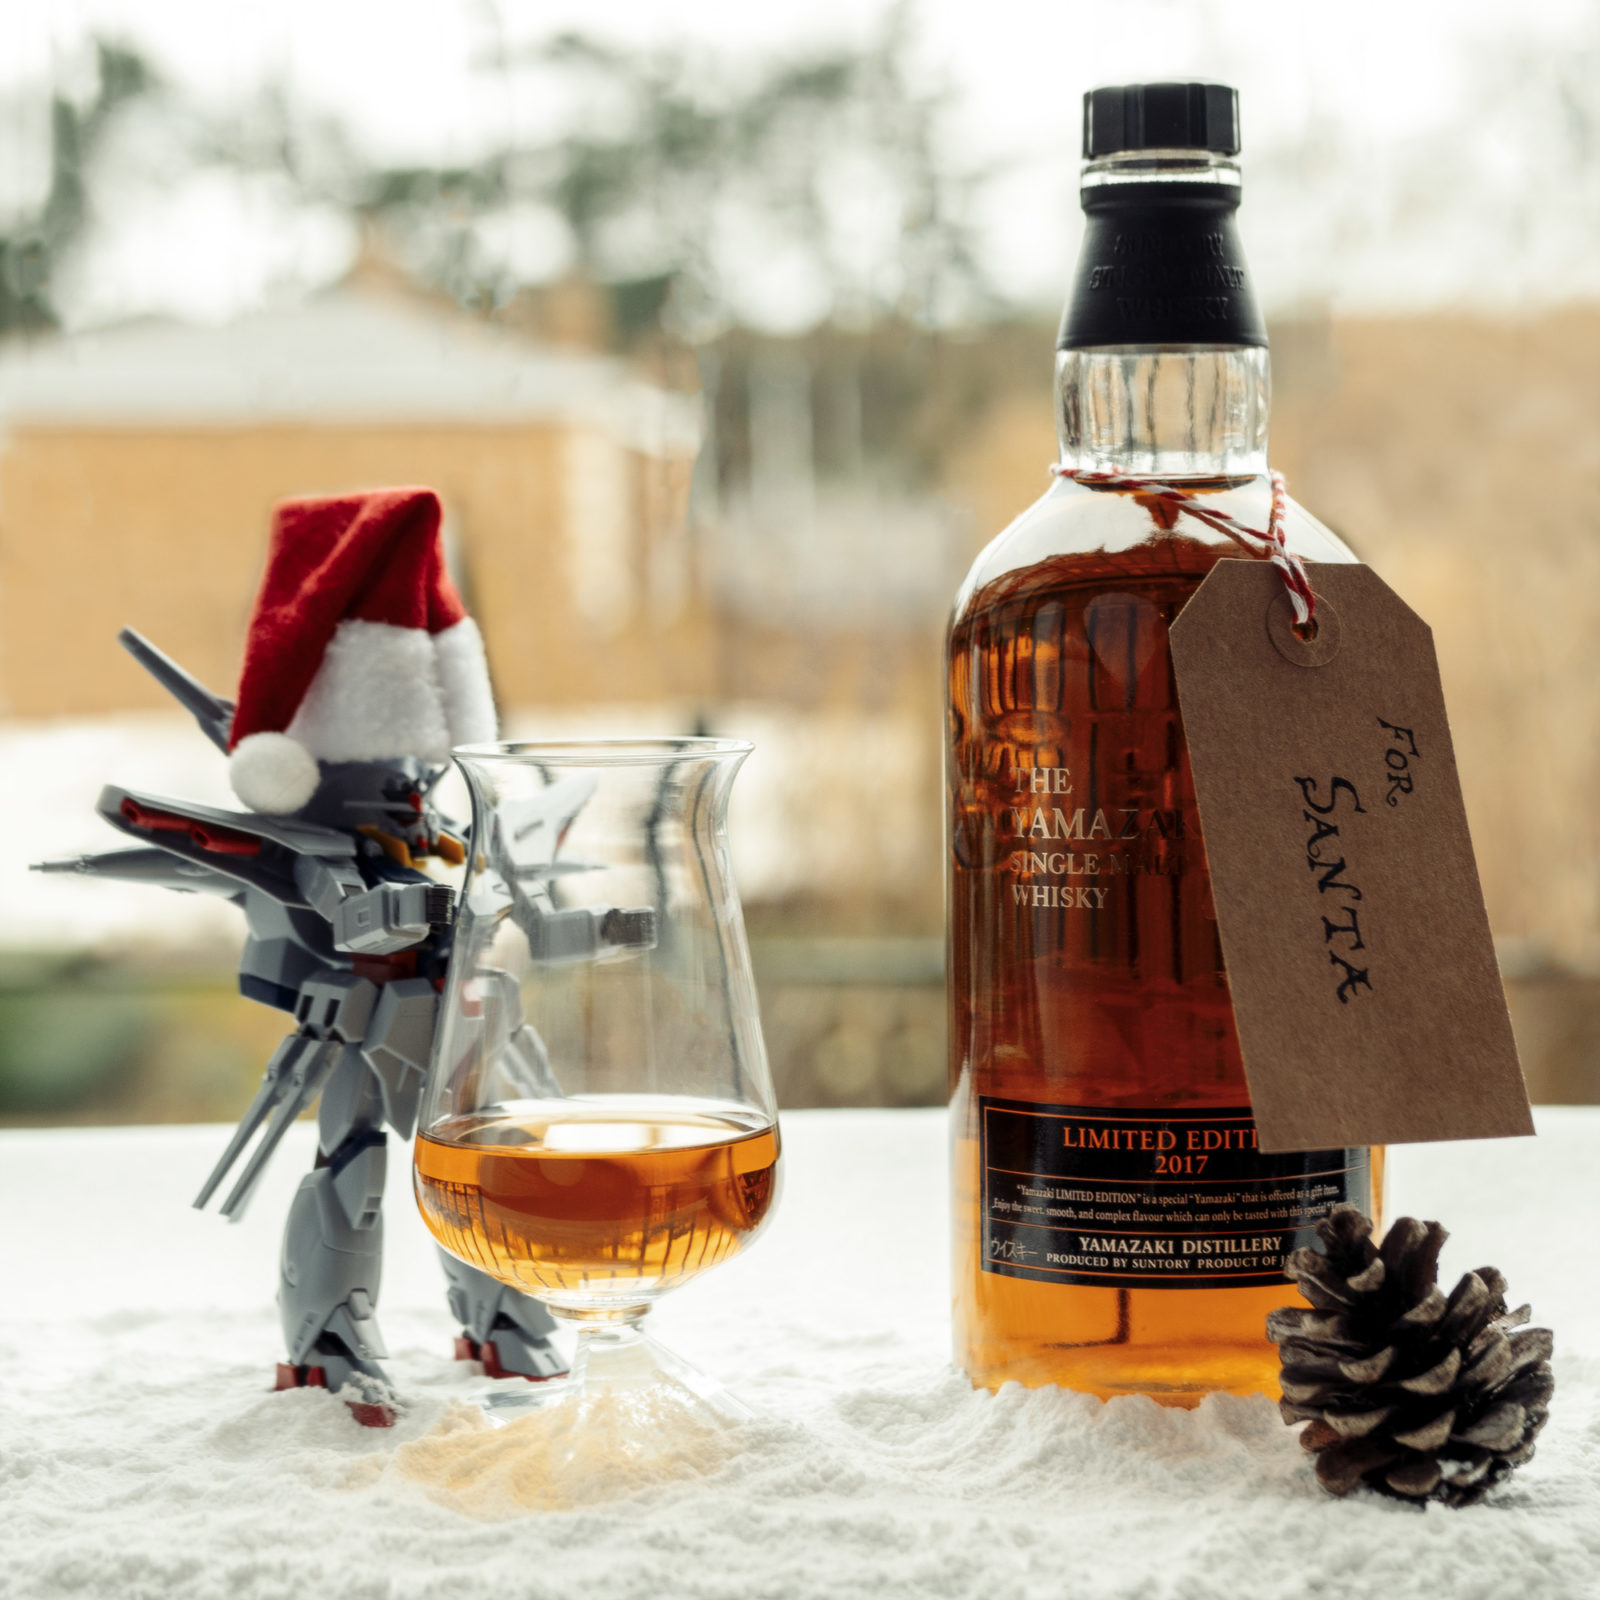 Photo of Yamazaki 2017 Limited Edition Japanese Whisky from Stephen in Dublin Ireland